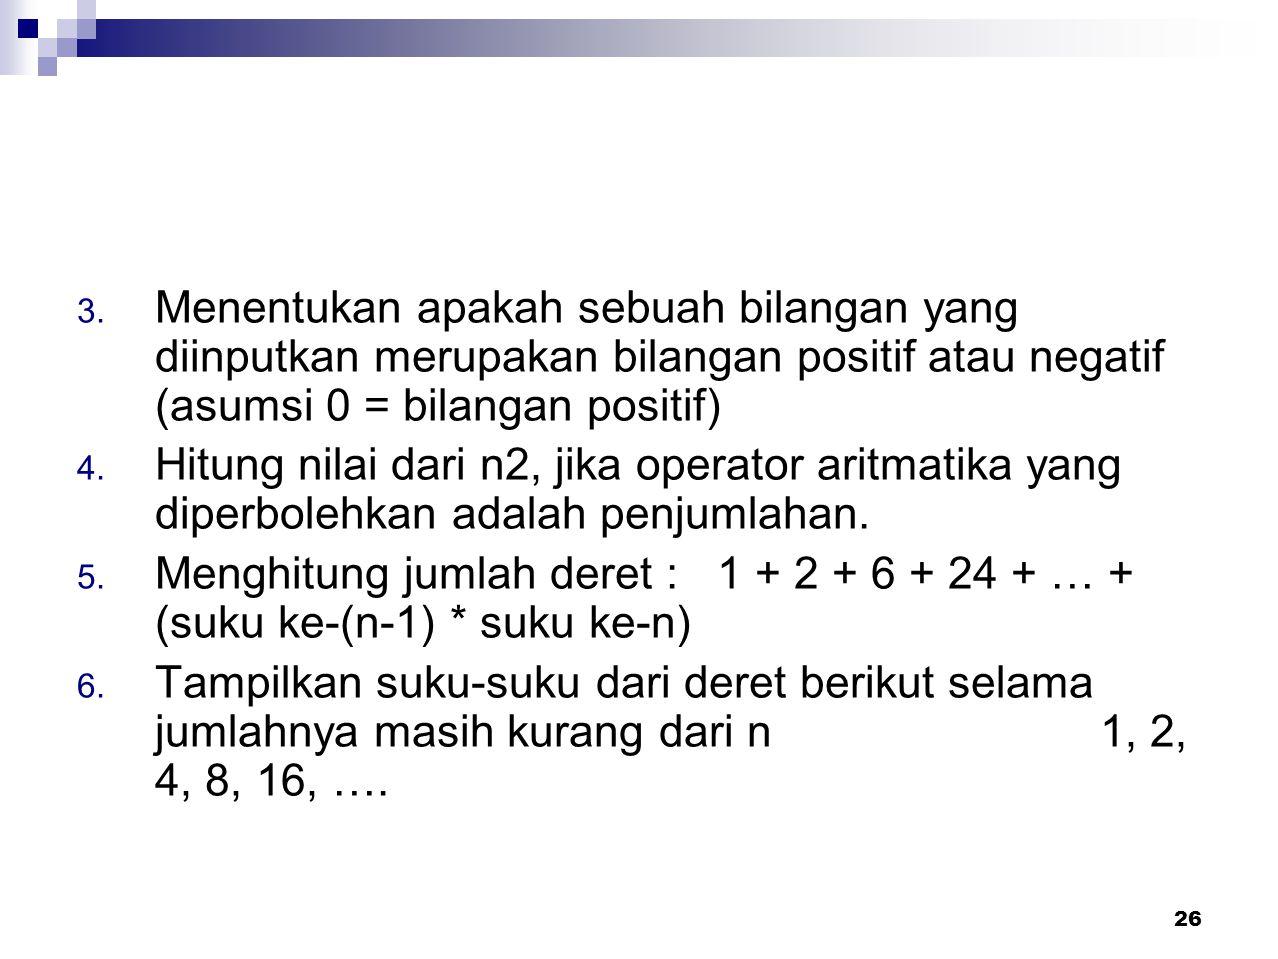 Menentukan apakah sebuah bilangan yang diinputkan merupakan bilangan positif atau negatif (asumsi 0 = bilangan positif)